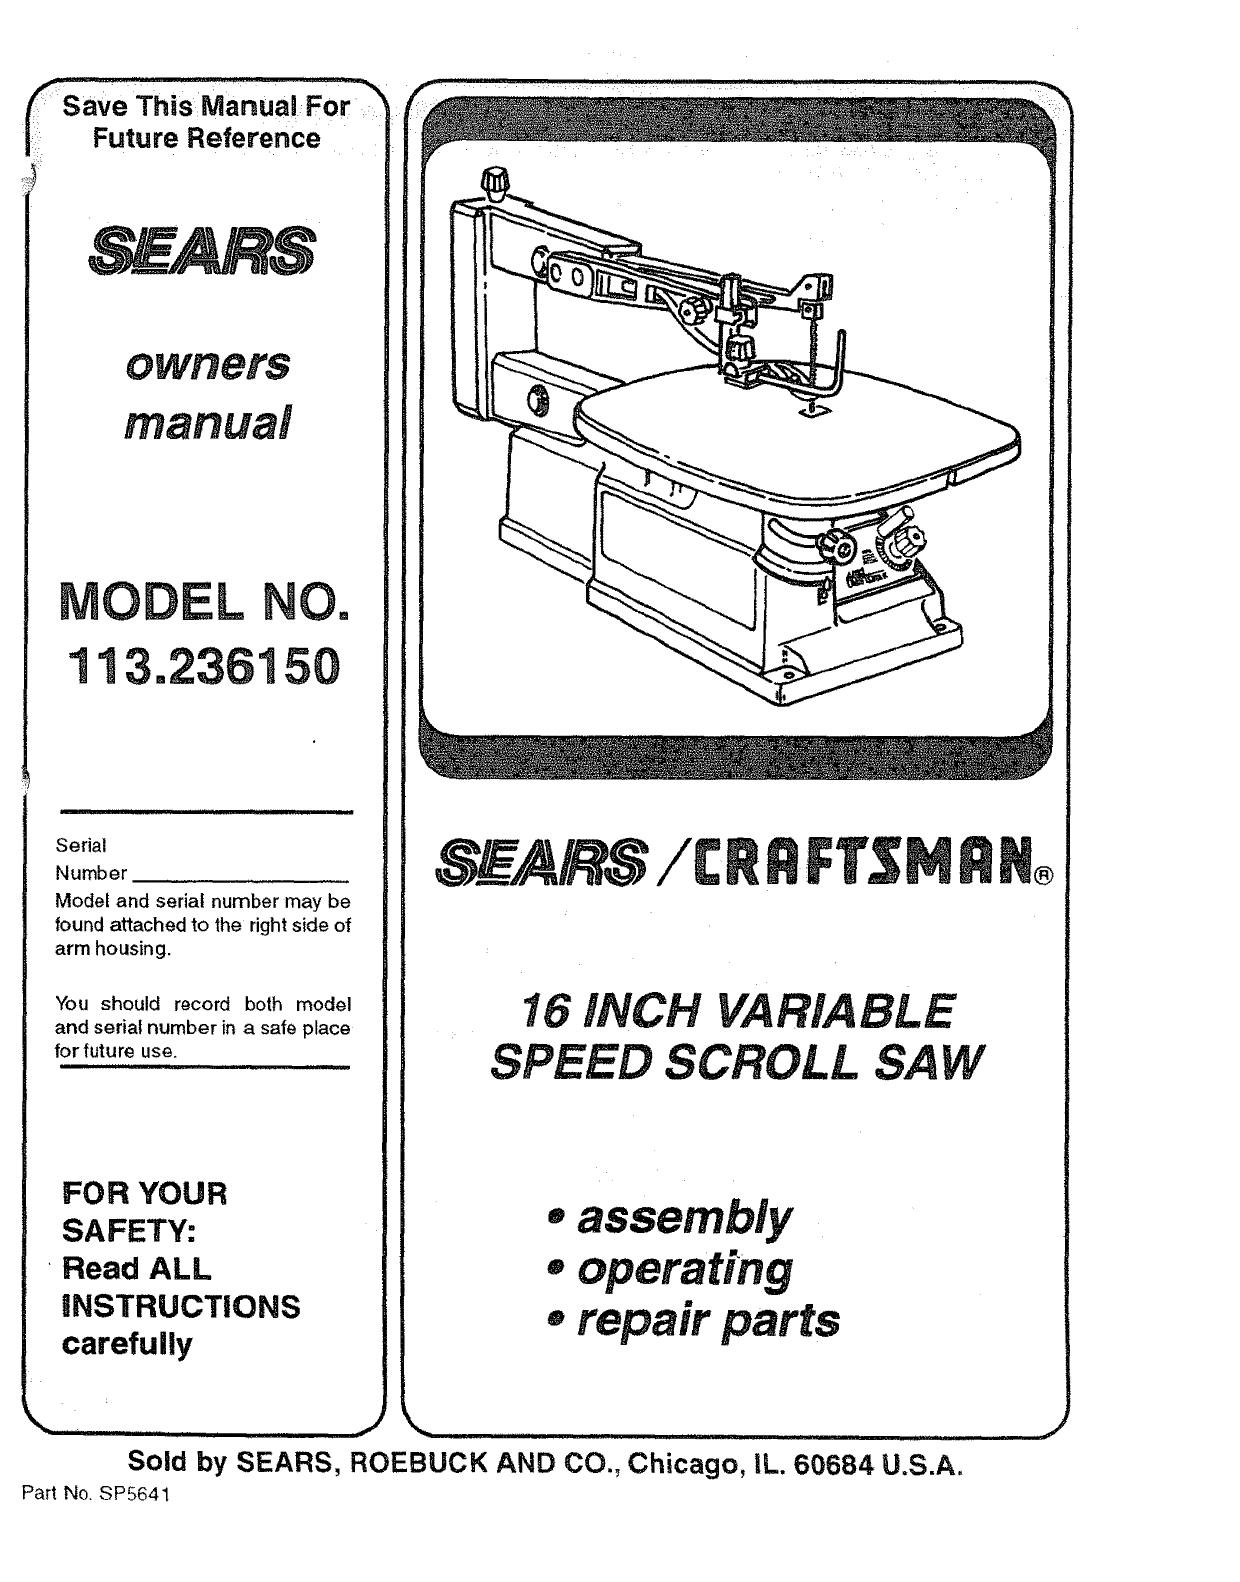 craftsman saw wiring diagram craftsman 113236150 user manual scroll saw manuals and guides l1002142  113236150 user manual scroll saw